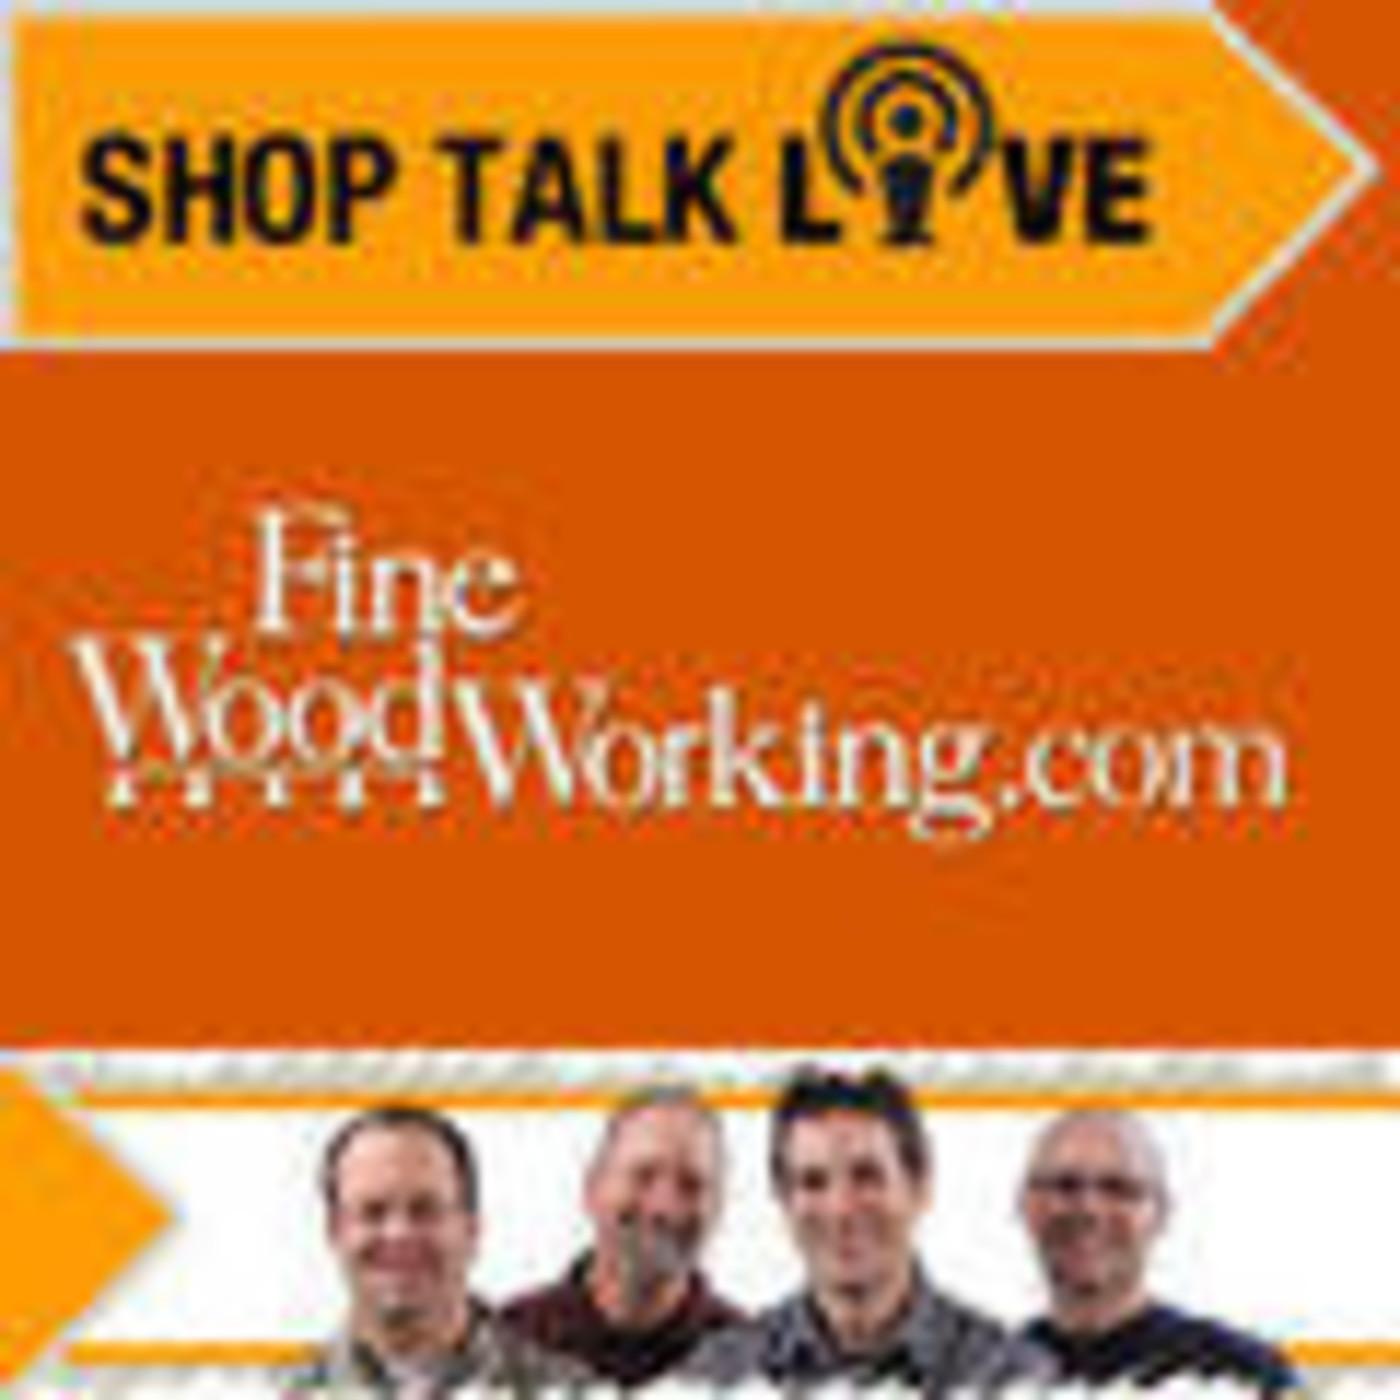 FineWoodworking.com